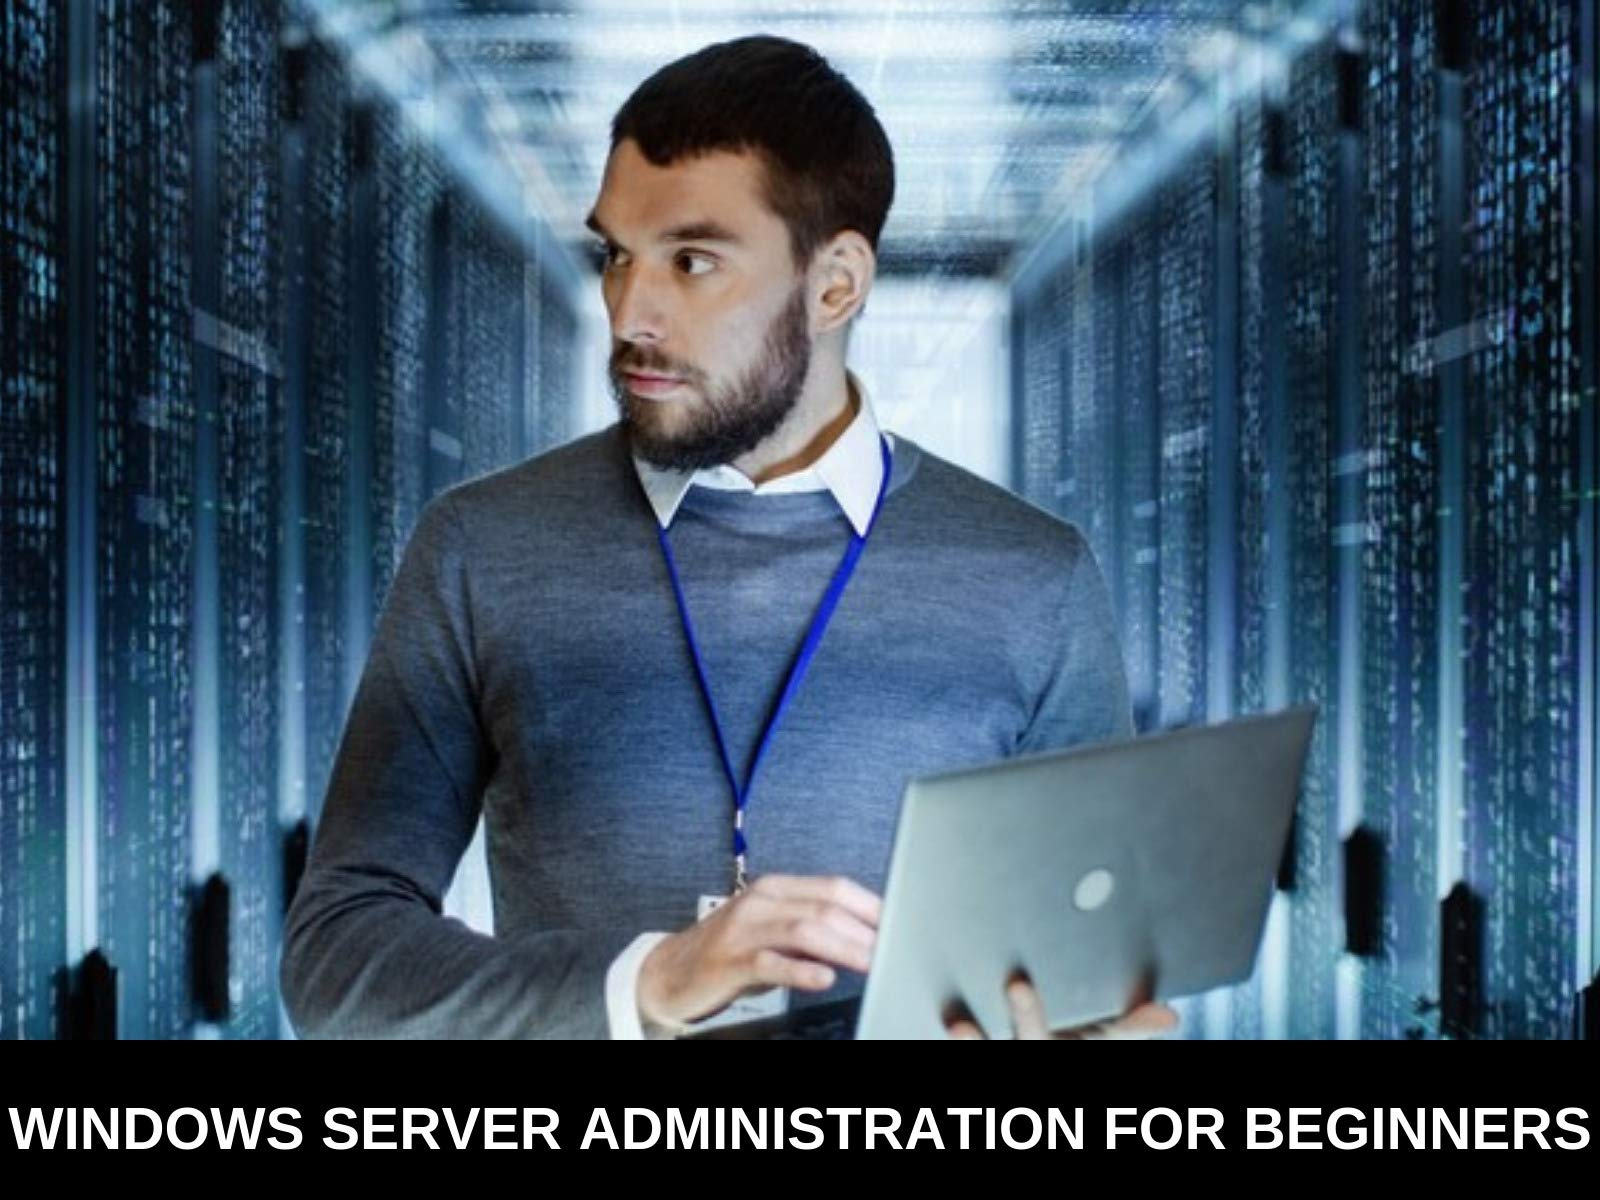 Windows Server Administration For Beginners on Amazon Prime Video UK